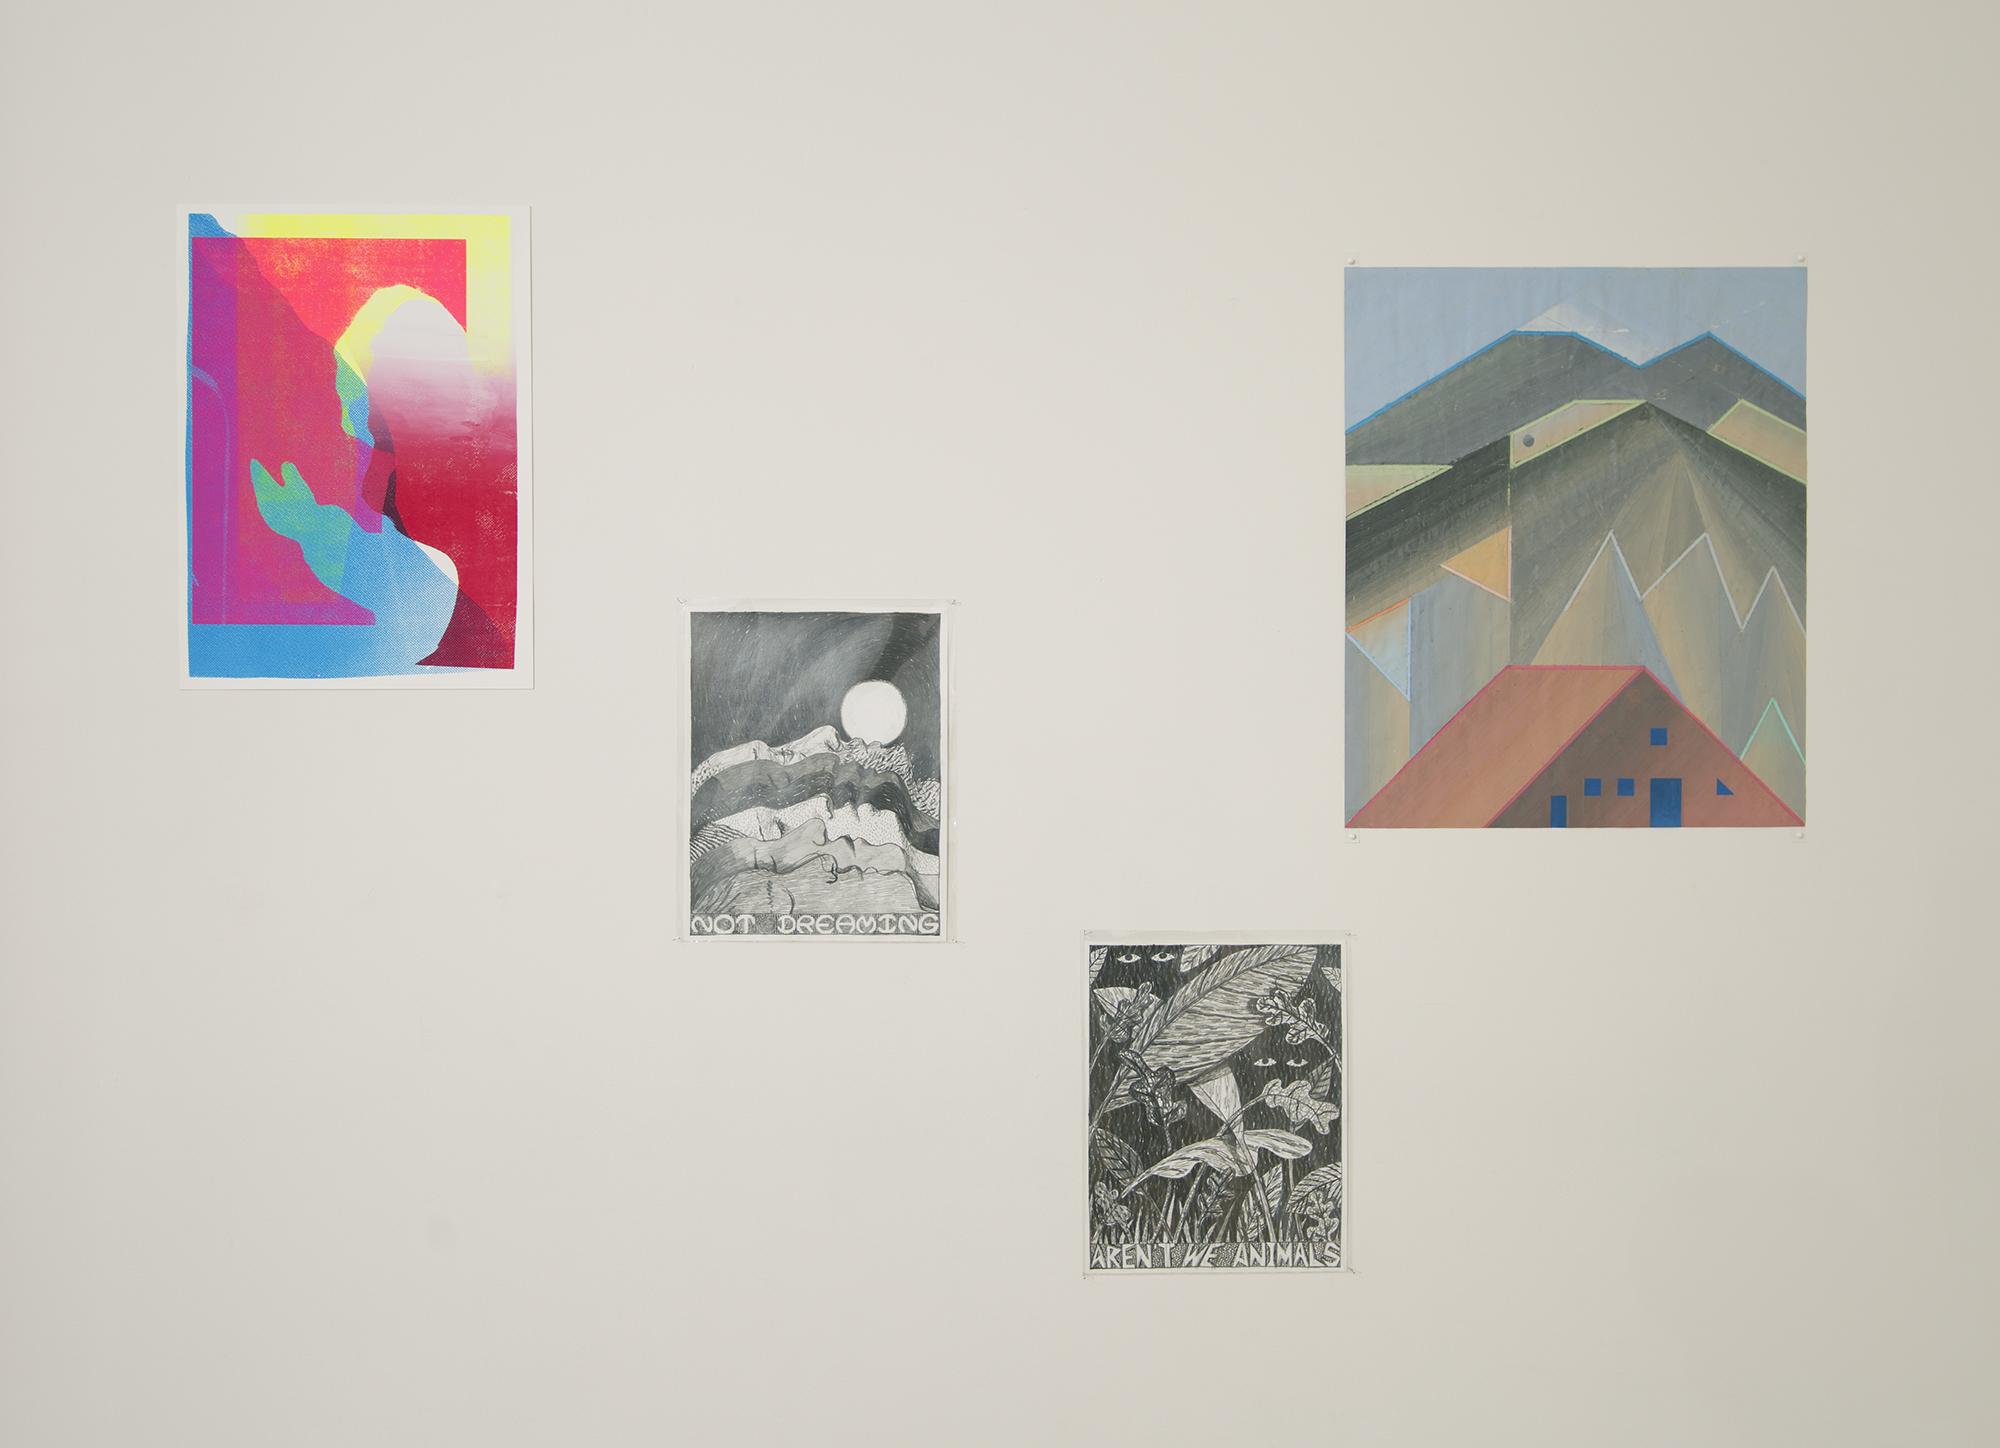 Clara Bausch / Benjamin Degen (2 drawings) / John Hodany